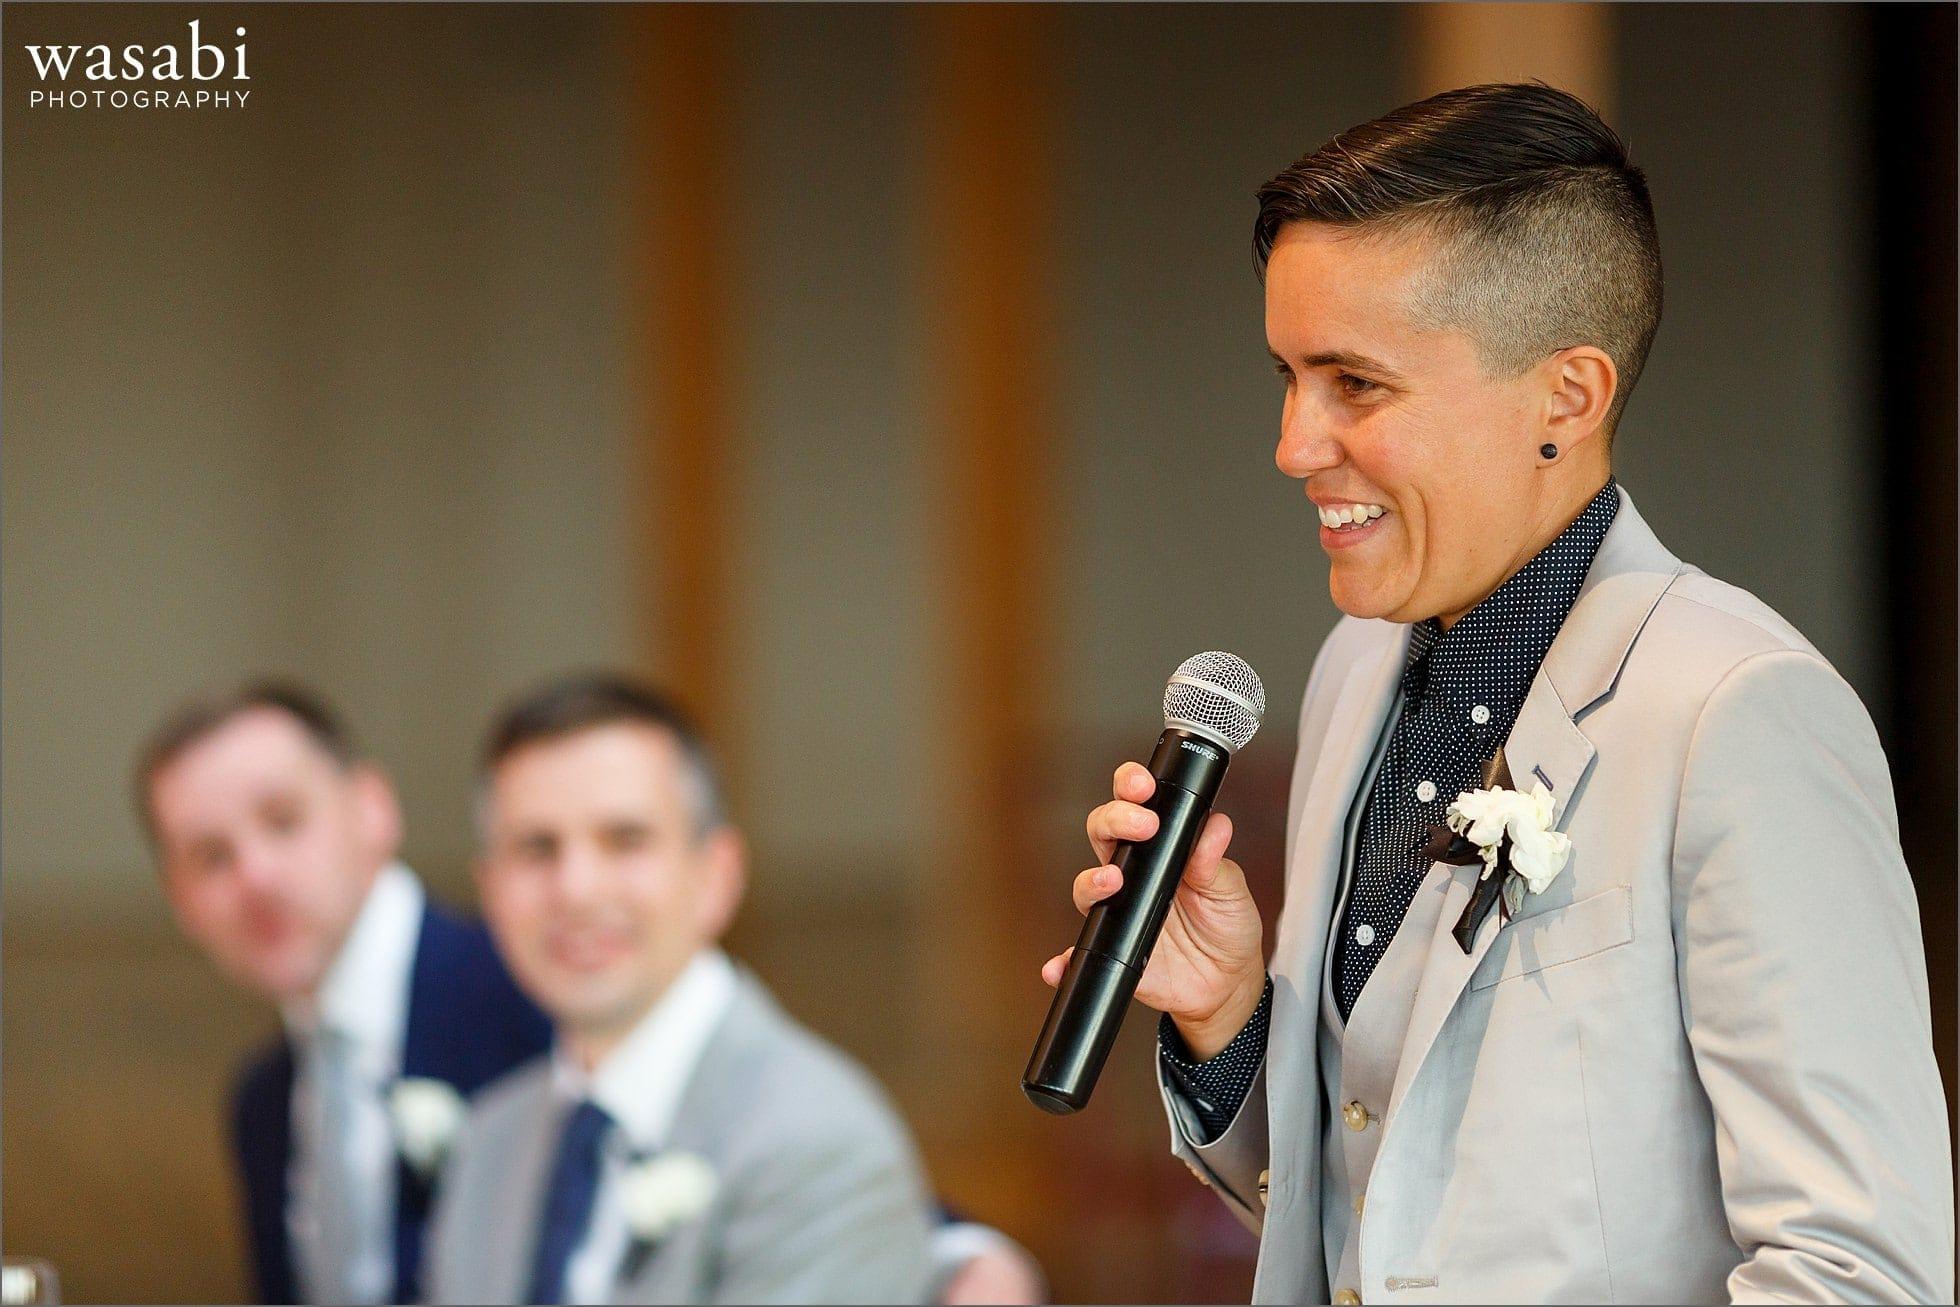 Grooms sister best woman toast during wedding reception at Bridgeport Art Center